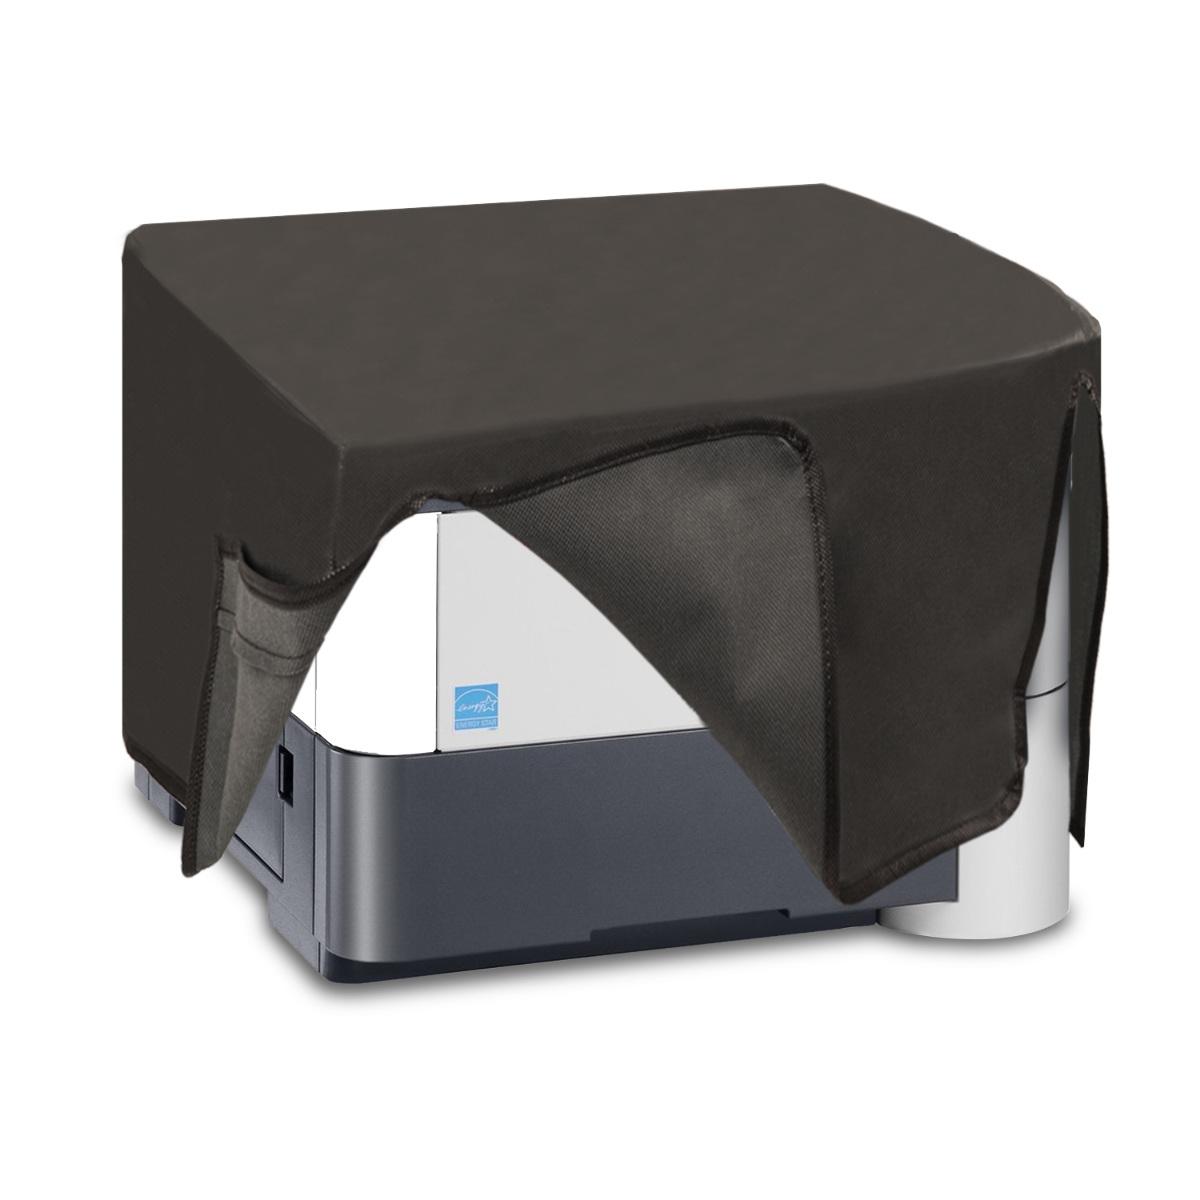 KW Κάλυμμα Εκτυπωτή Kyocera Ecosys P3050dn / P3055dn - Dark Grey (46828.19)